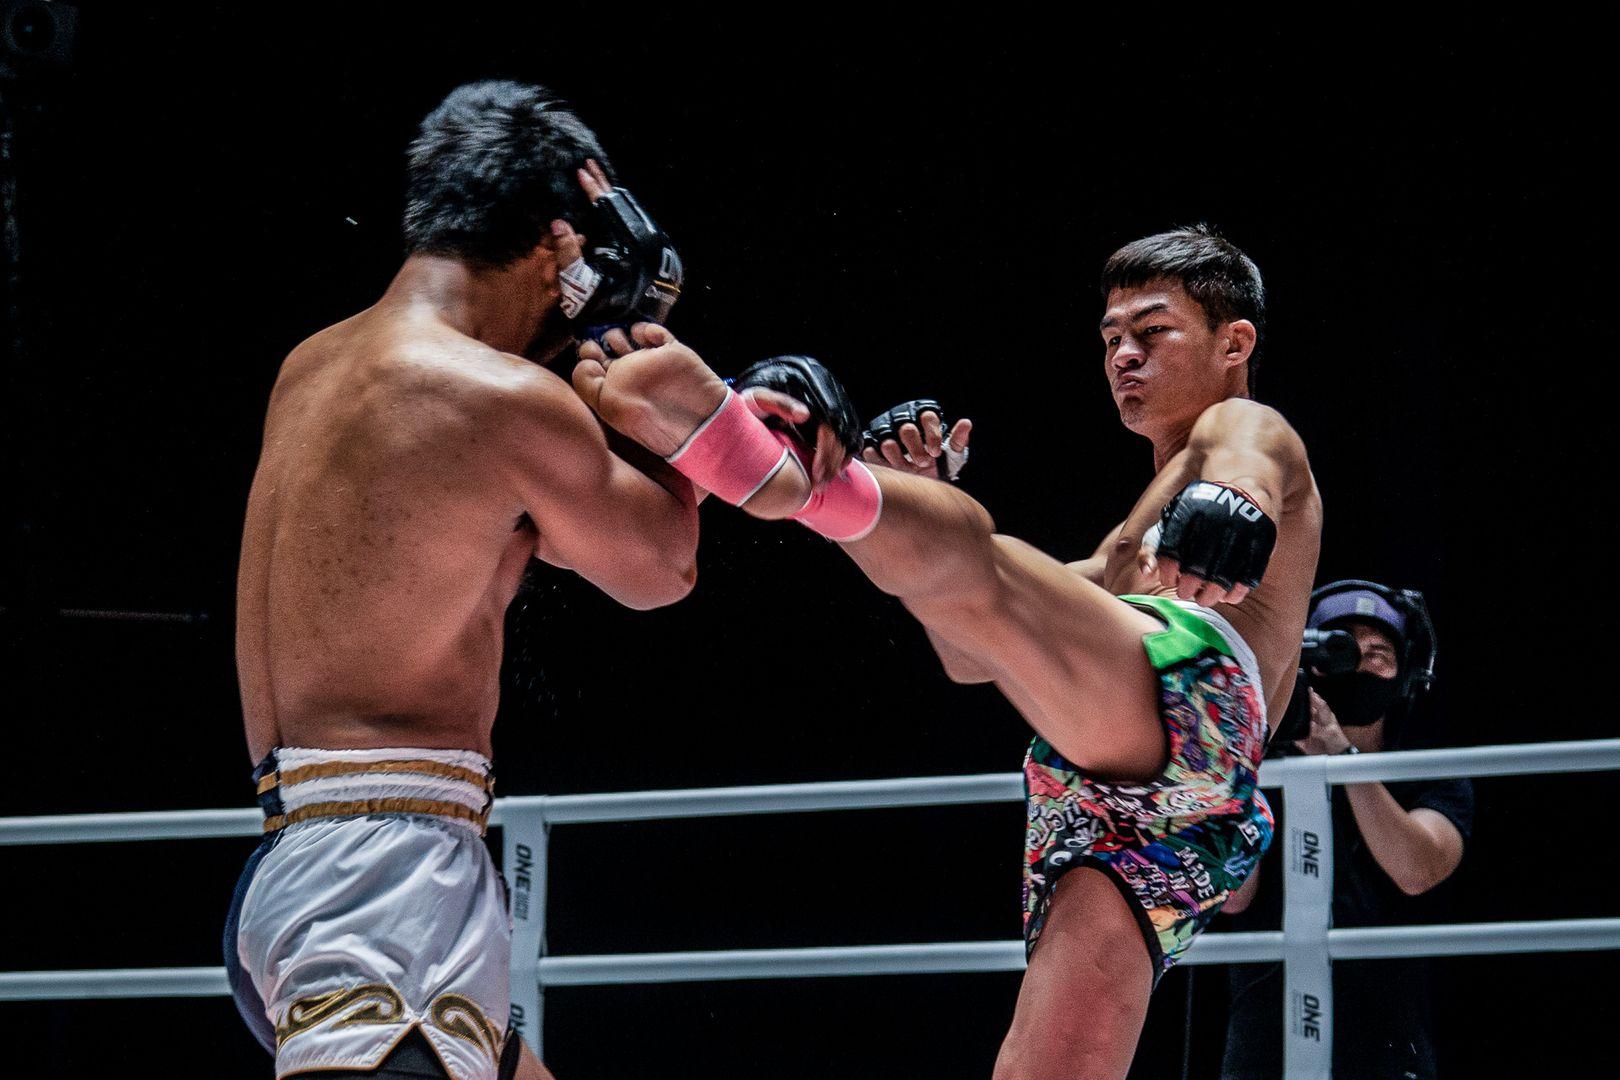 Muay Thai fighter Saemapetch Fairtex